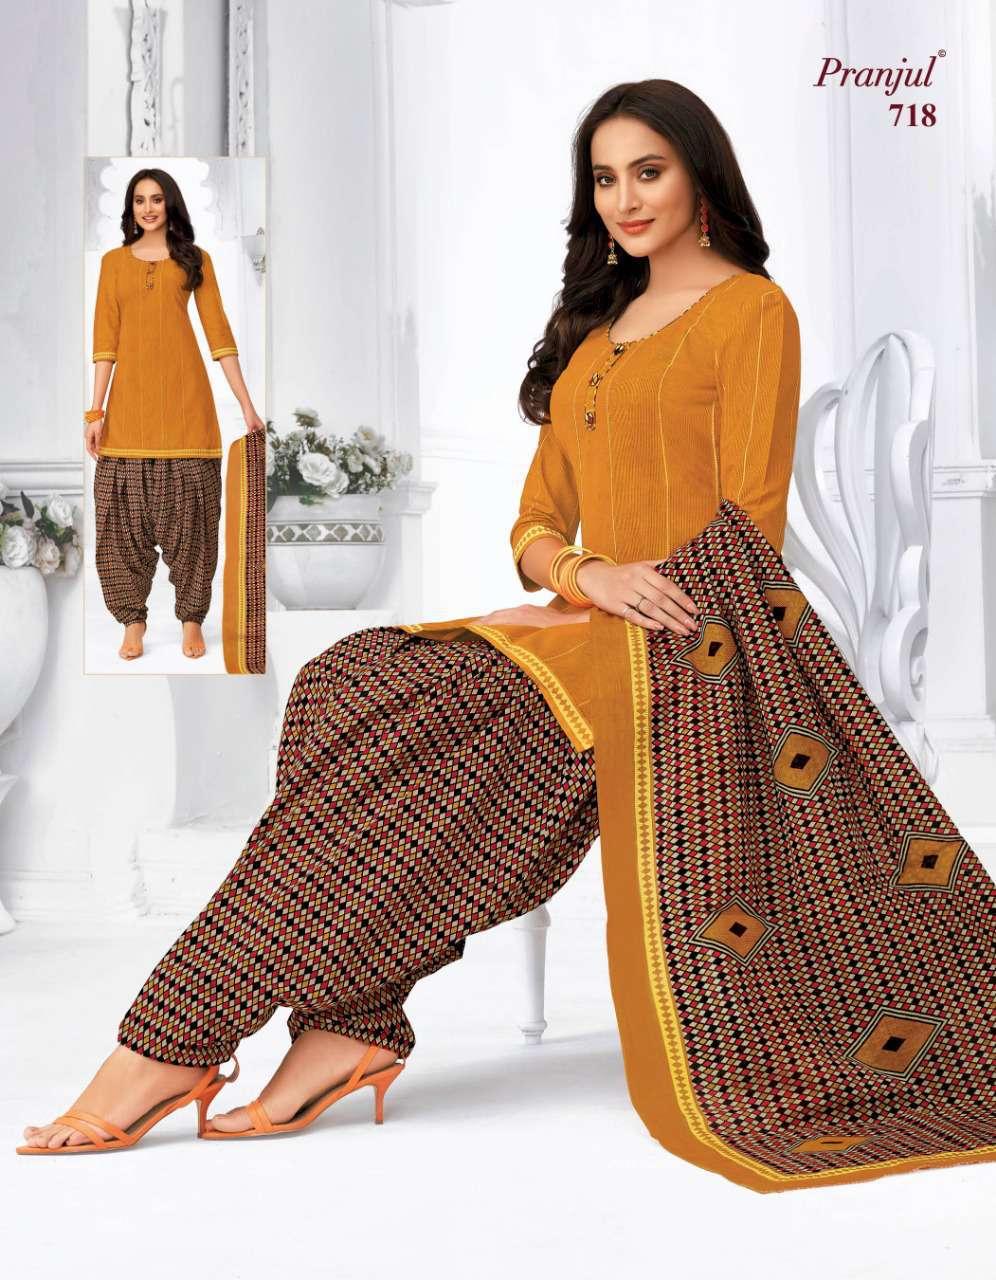 Pranjul Priyanka Vol 7 A Readymade Suit Wholesale Catalog 15 Pcs 13 - Pranjul Priyanka Vol 7 A Readymade Suit Wholesale Catalog 15 Pcs